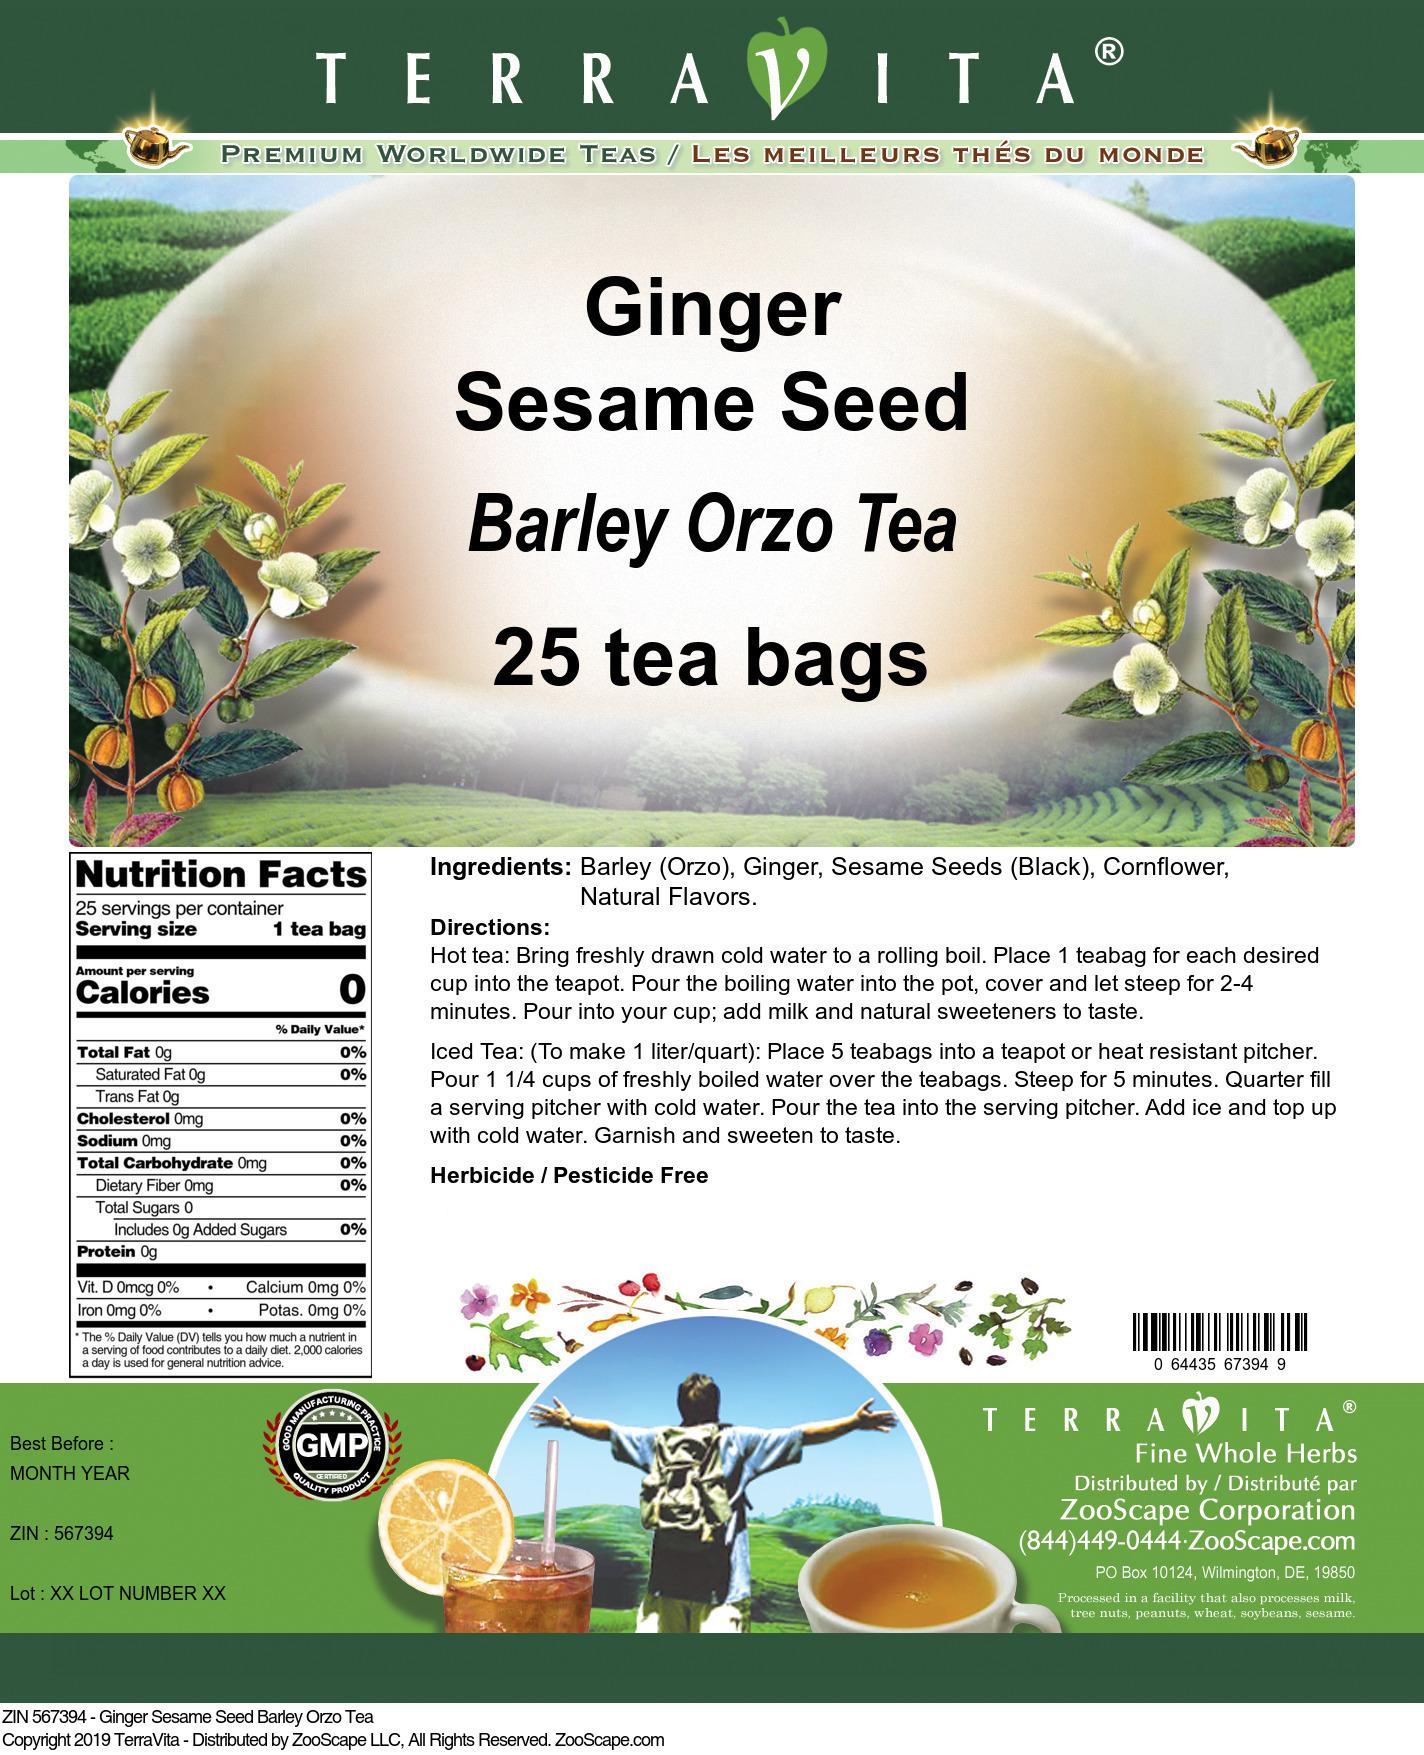 Ginger Sesame Seed Barley Orzo